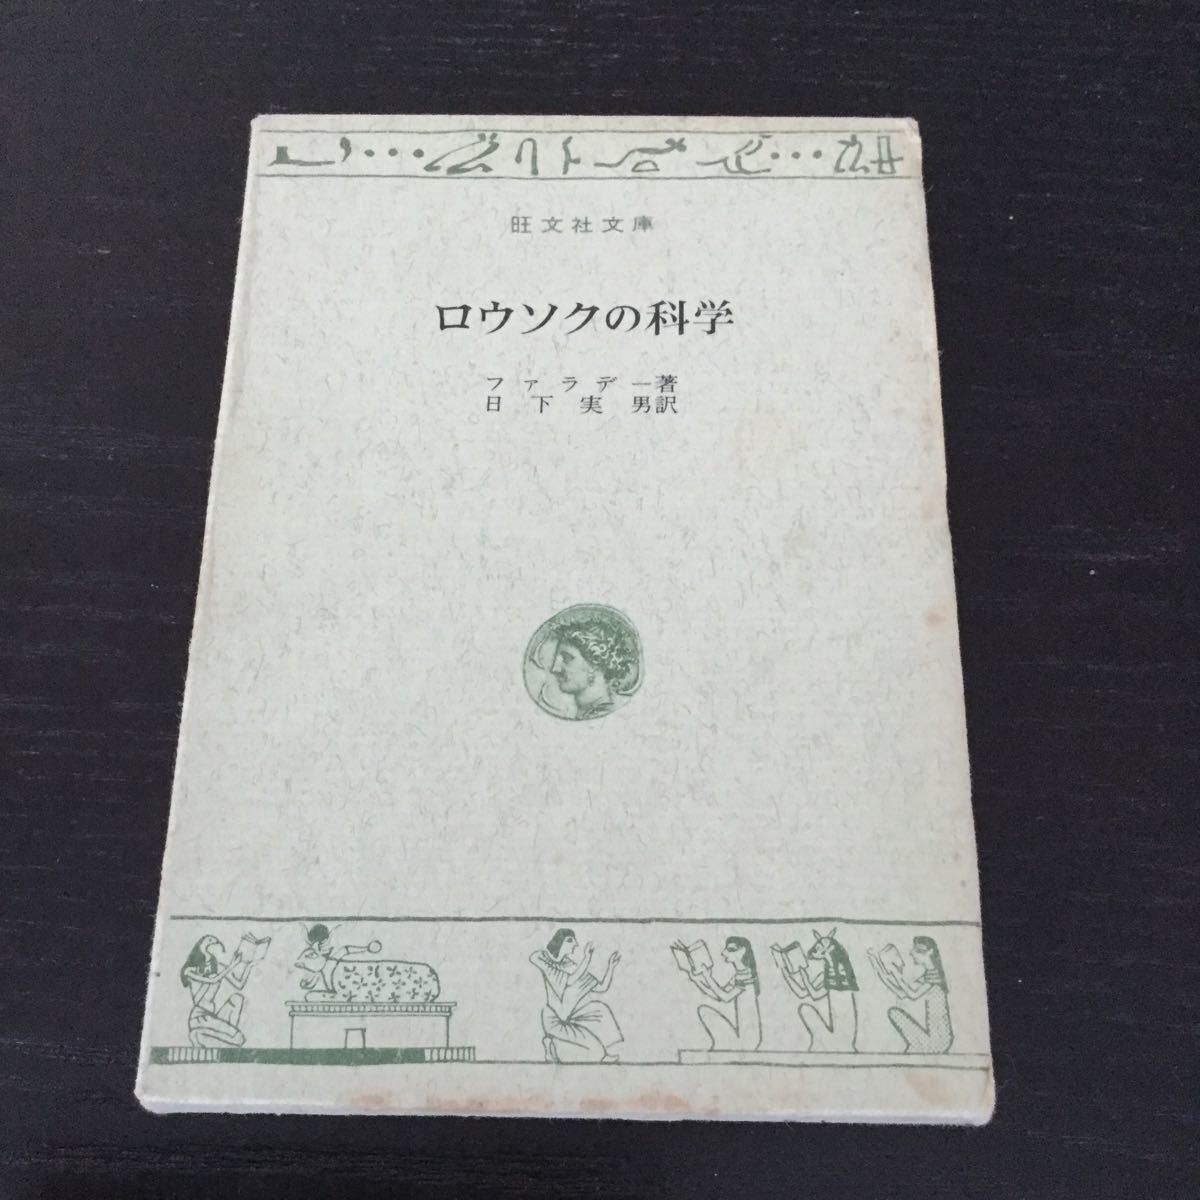 a37 ロウソクの科学 ファラデー 日下実男 小説 旺文社文庫 旺文社 _画像1